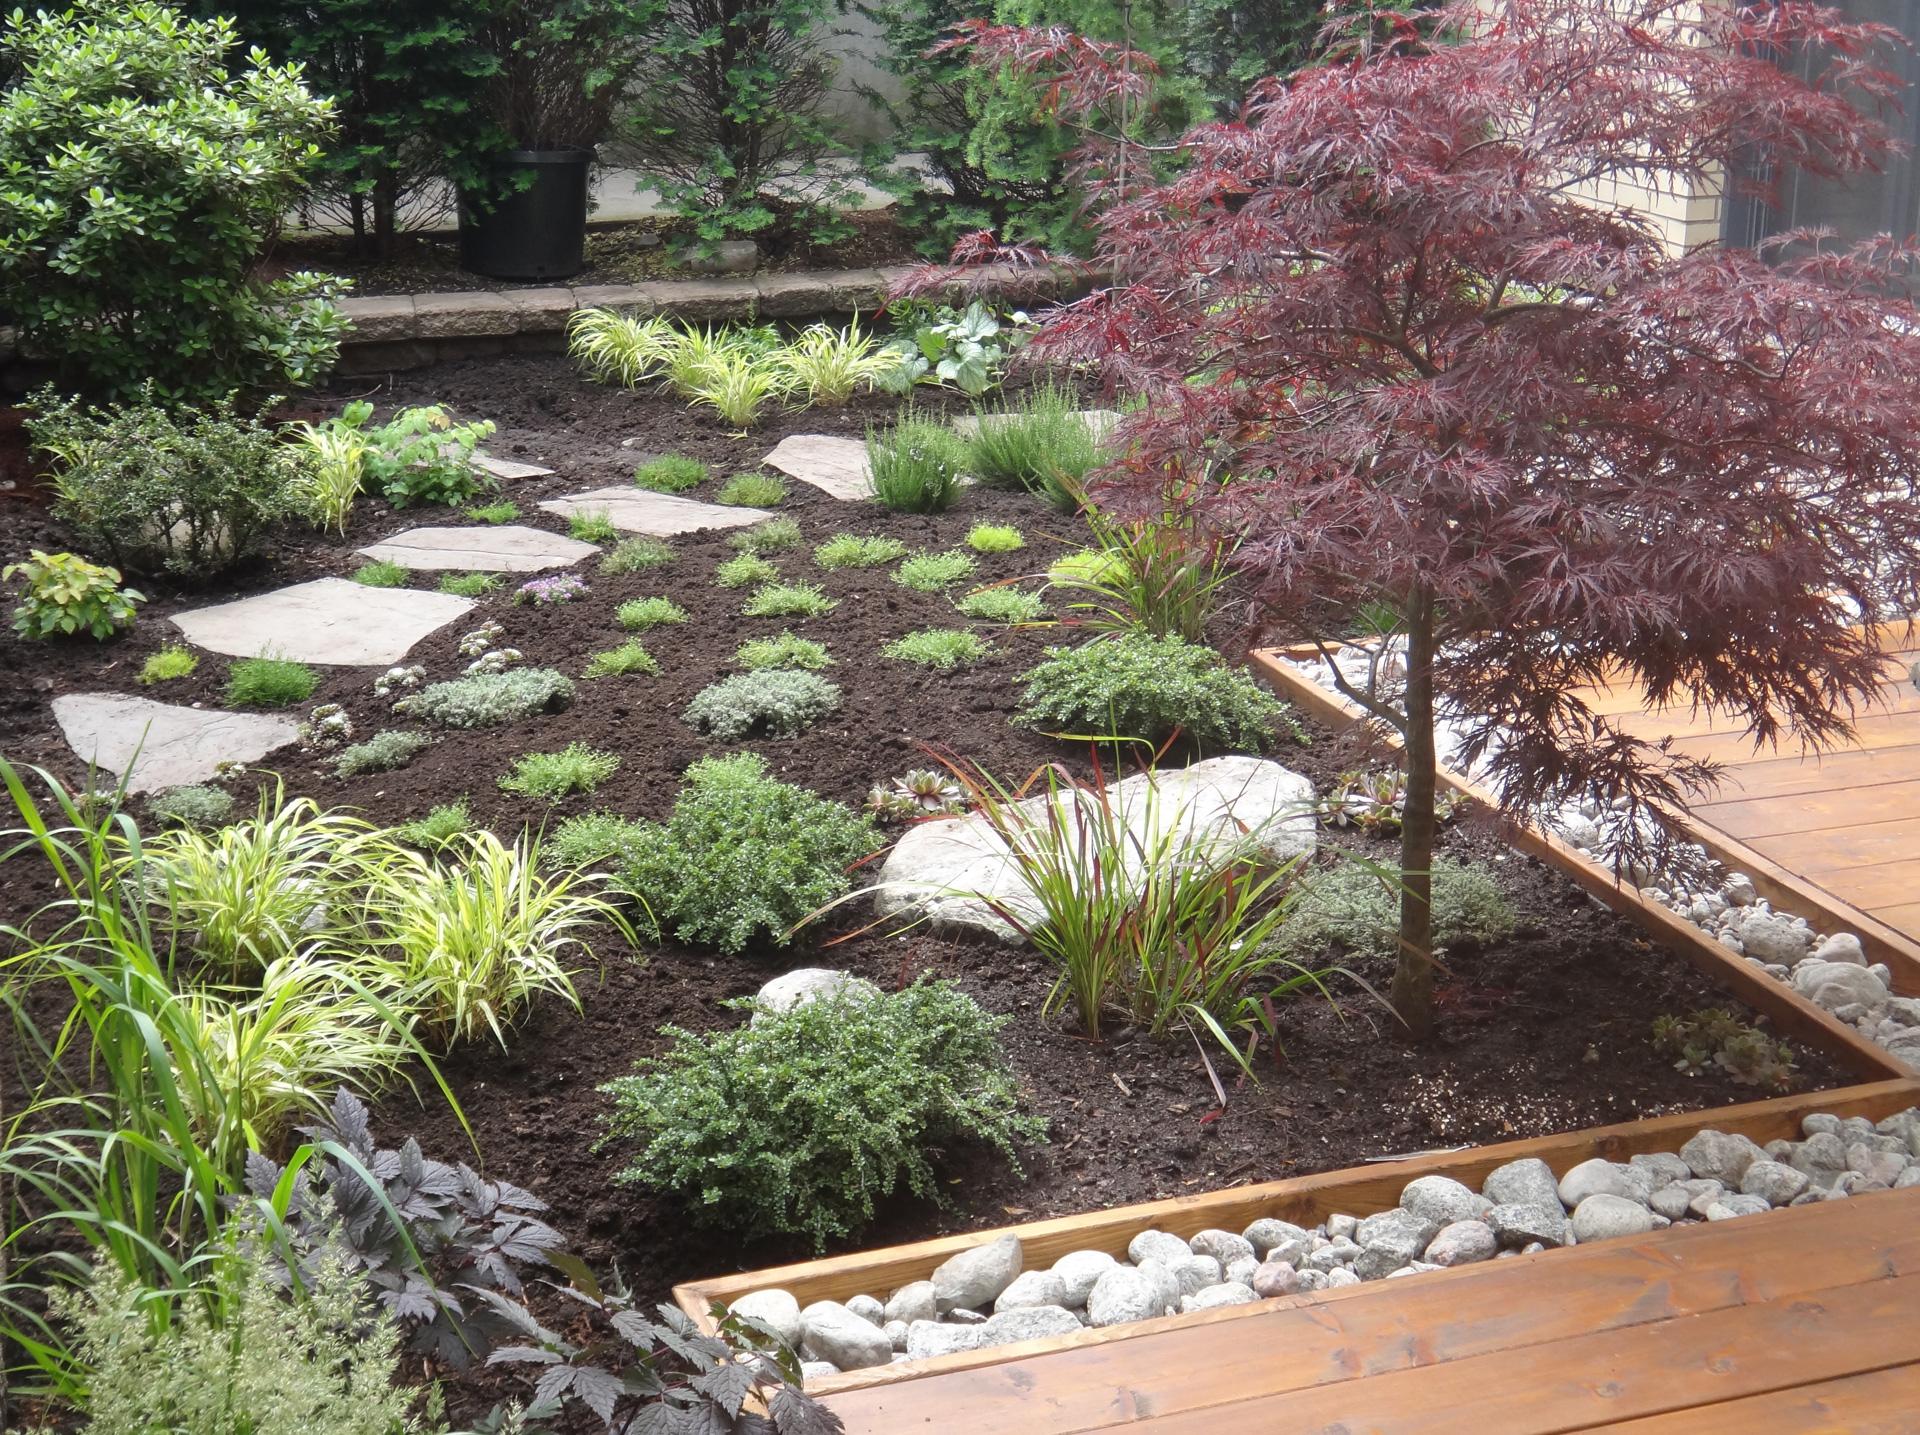 la pierre archives les jardins anim s inc. Black Bedroom Furniture Sets. Home Design Ideas